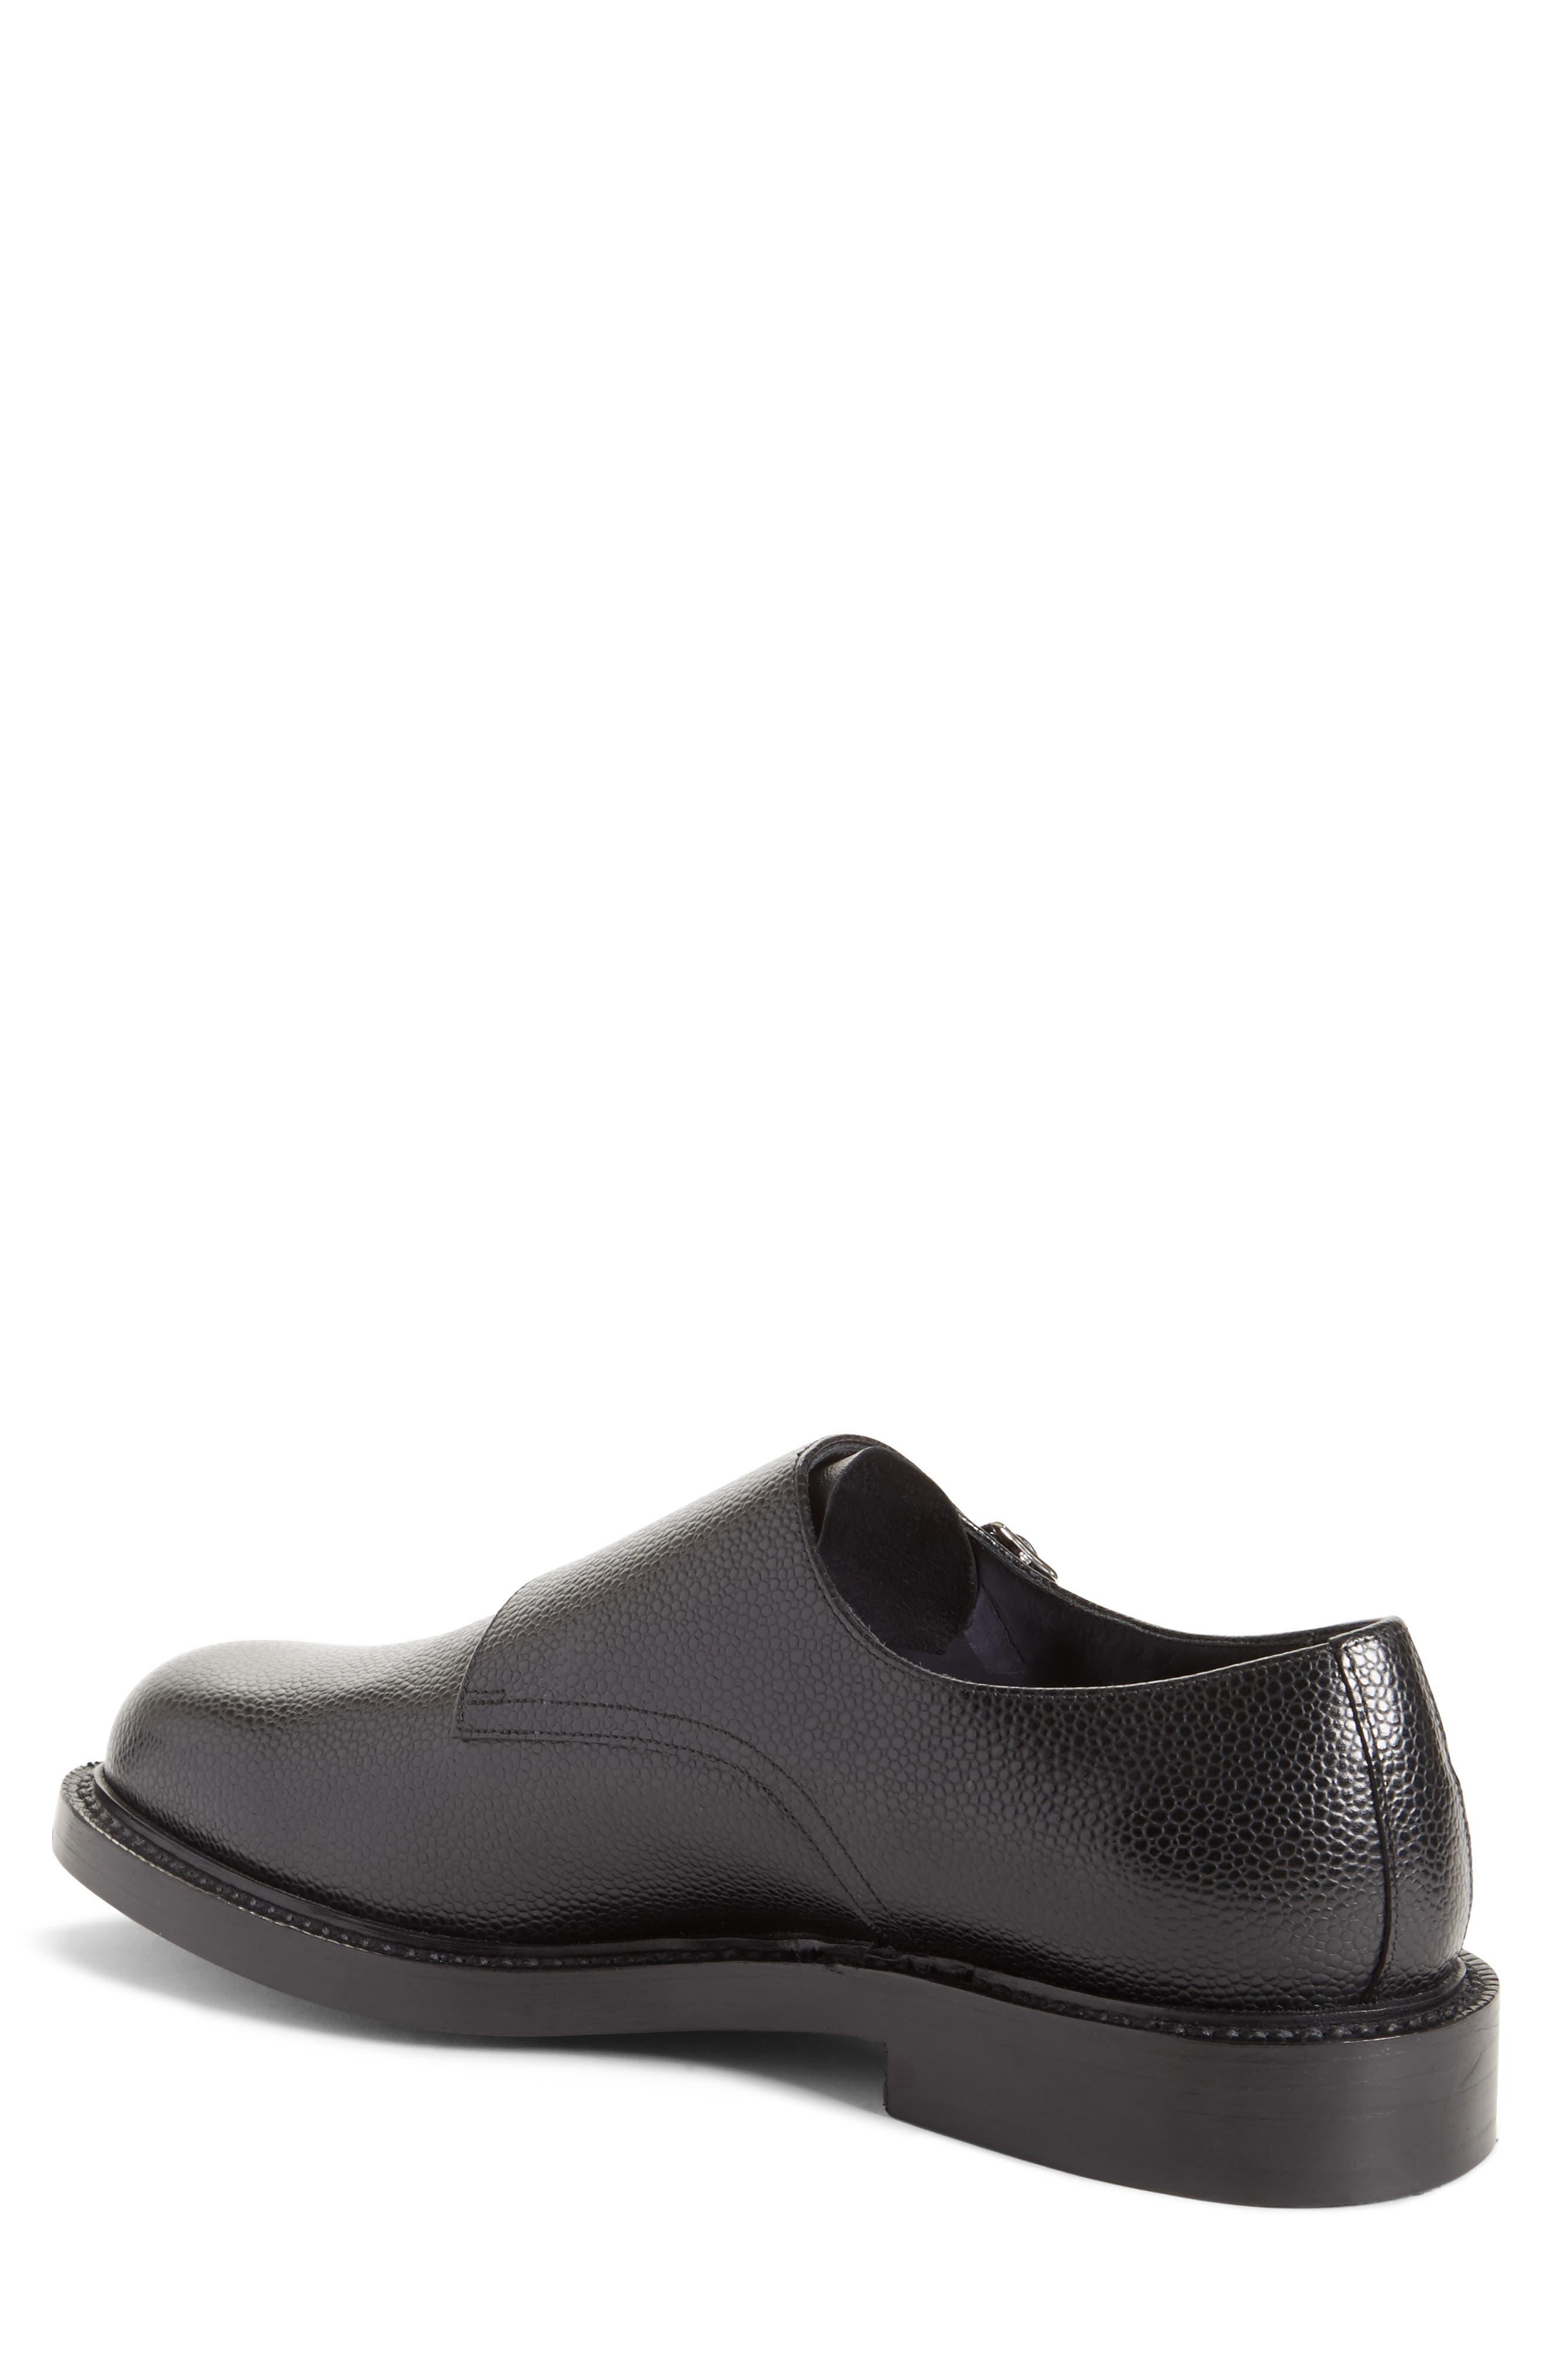 Hova Double Monk Strap Shoe,                             Alternate thumbnail 2, color,                             Black Leather